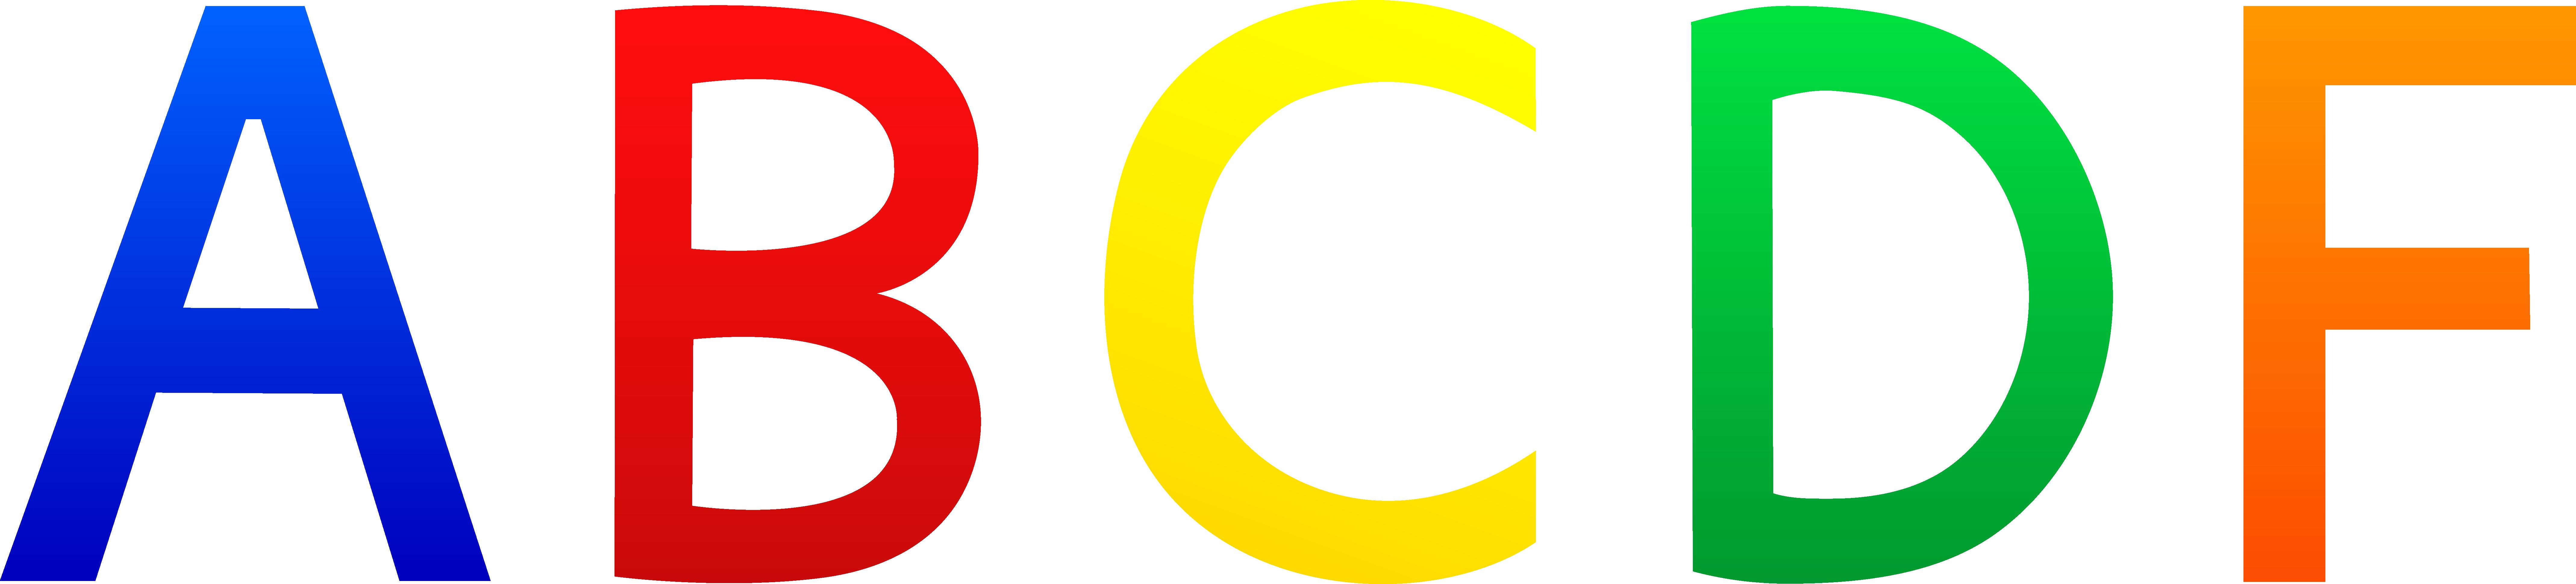 Free Clip Art Letters